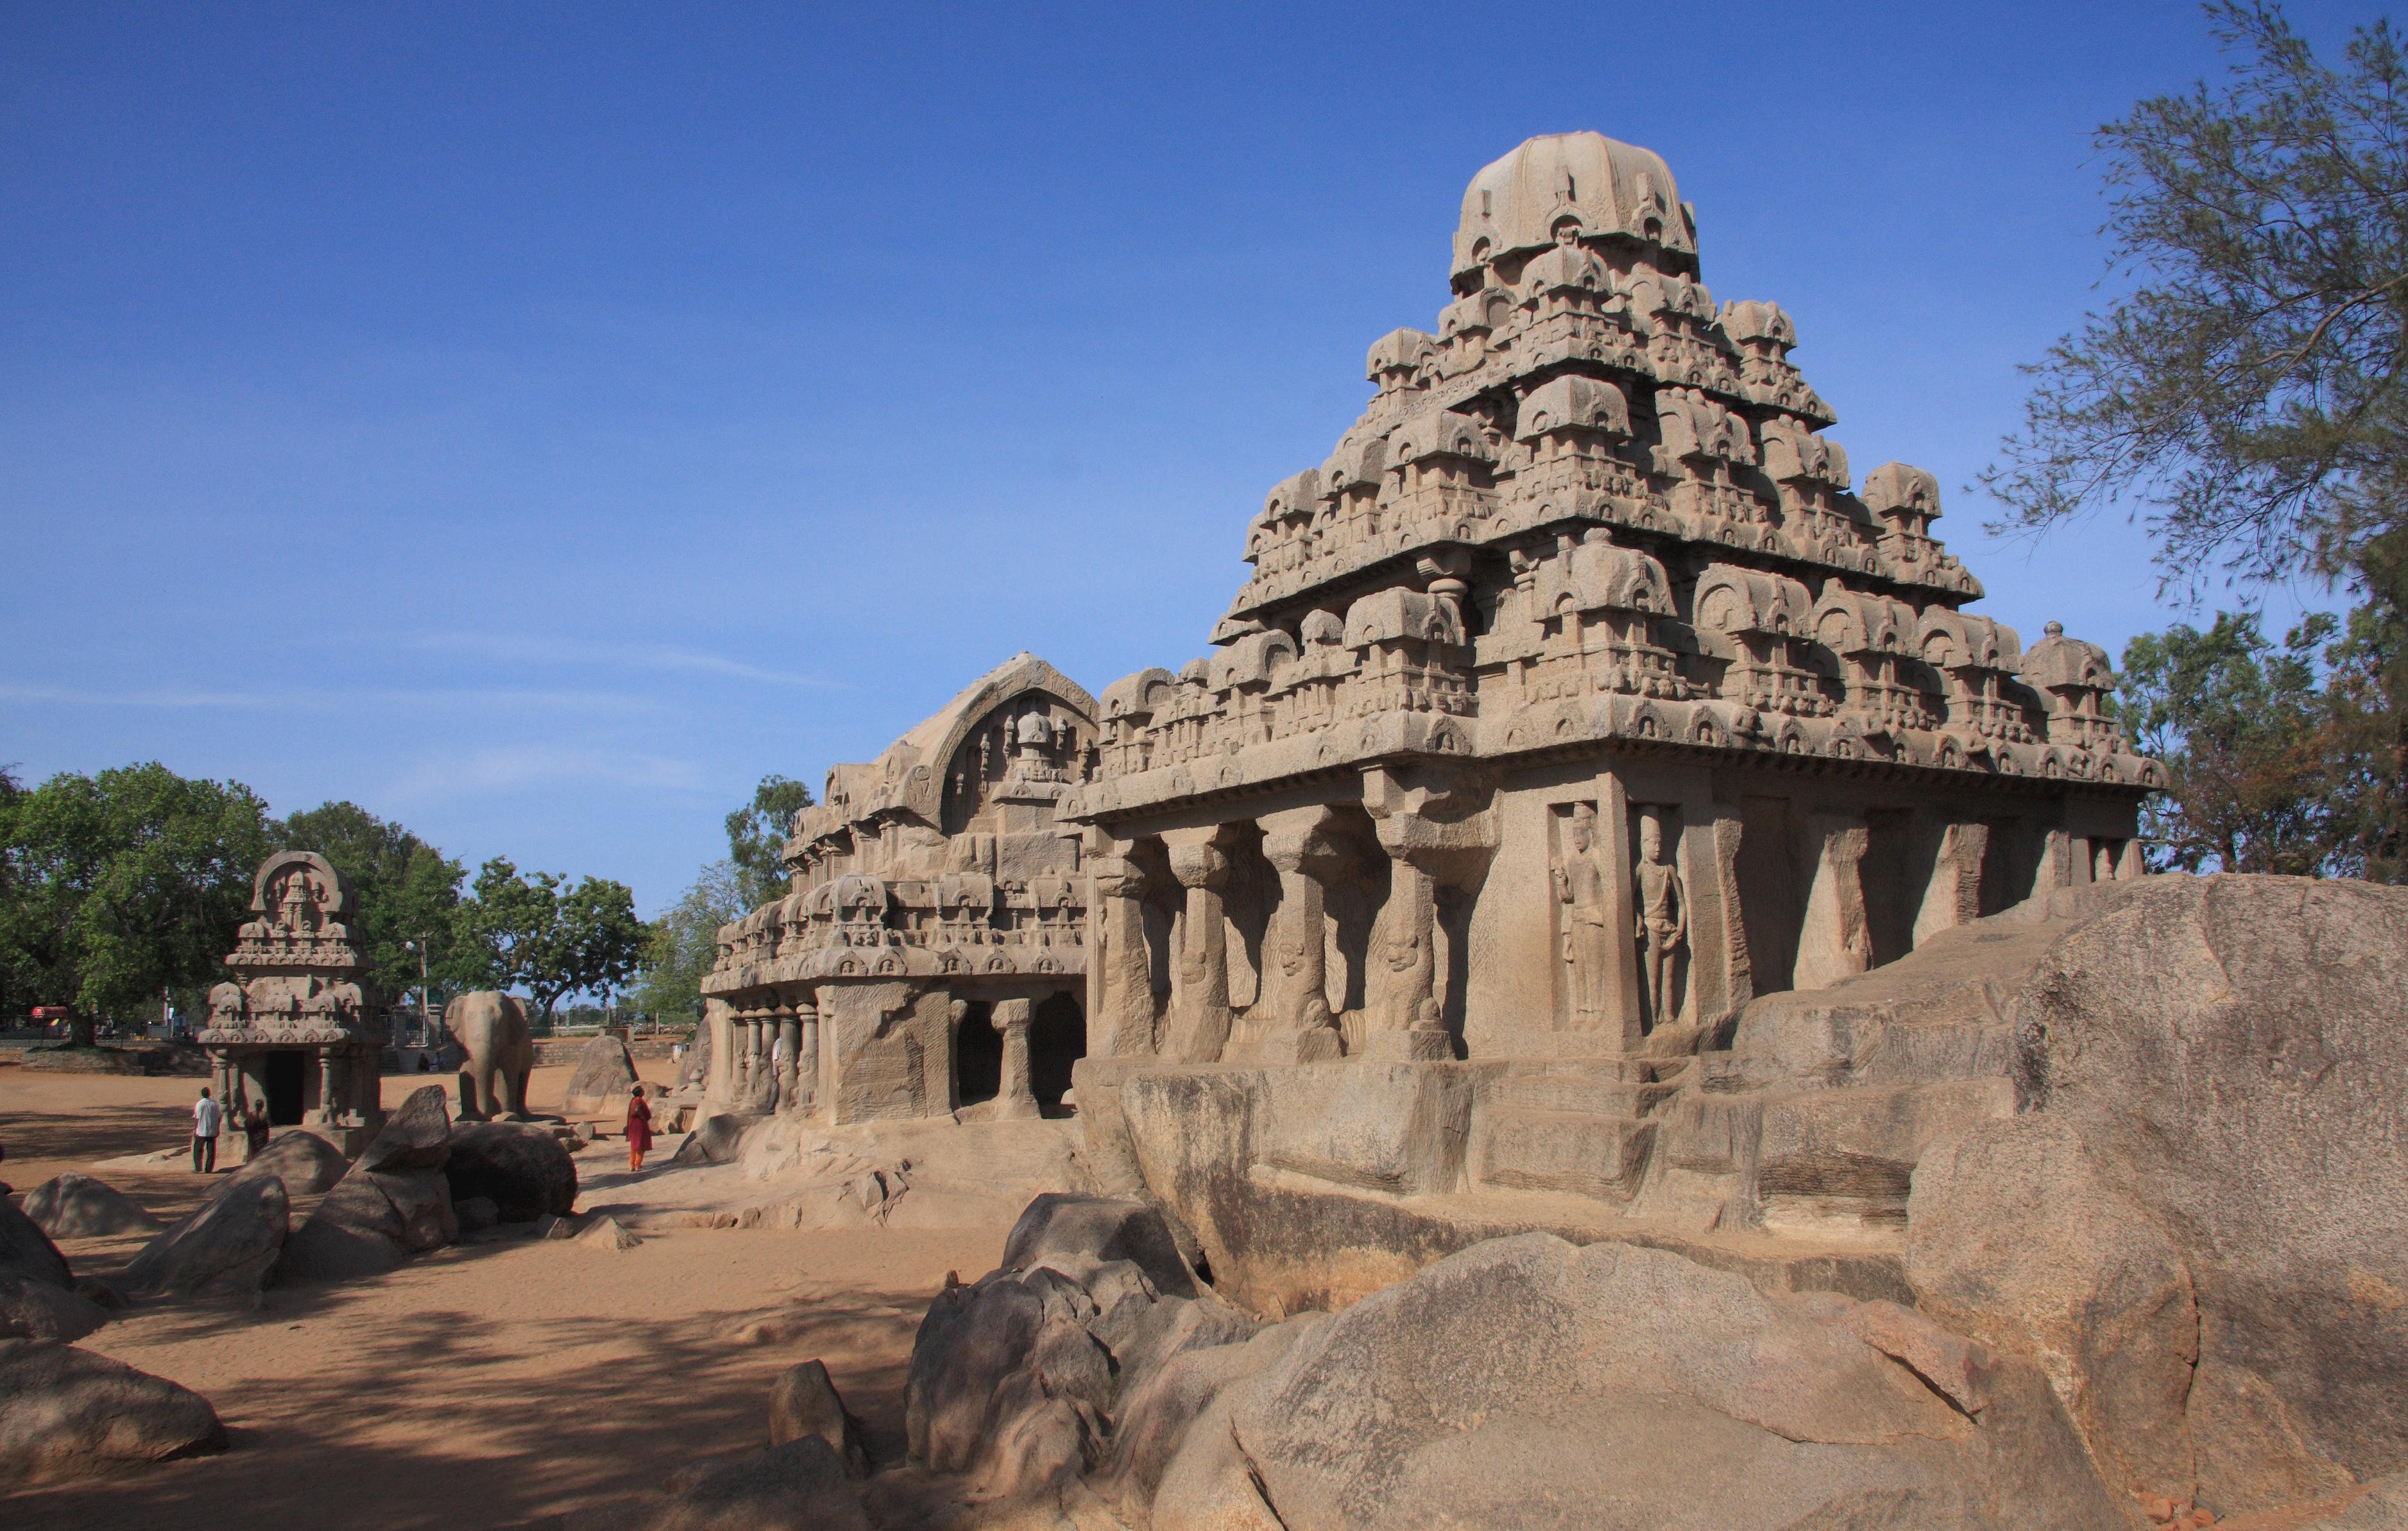 Rock-cut architecture